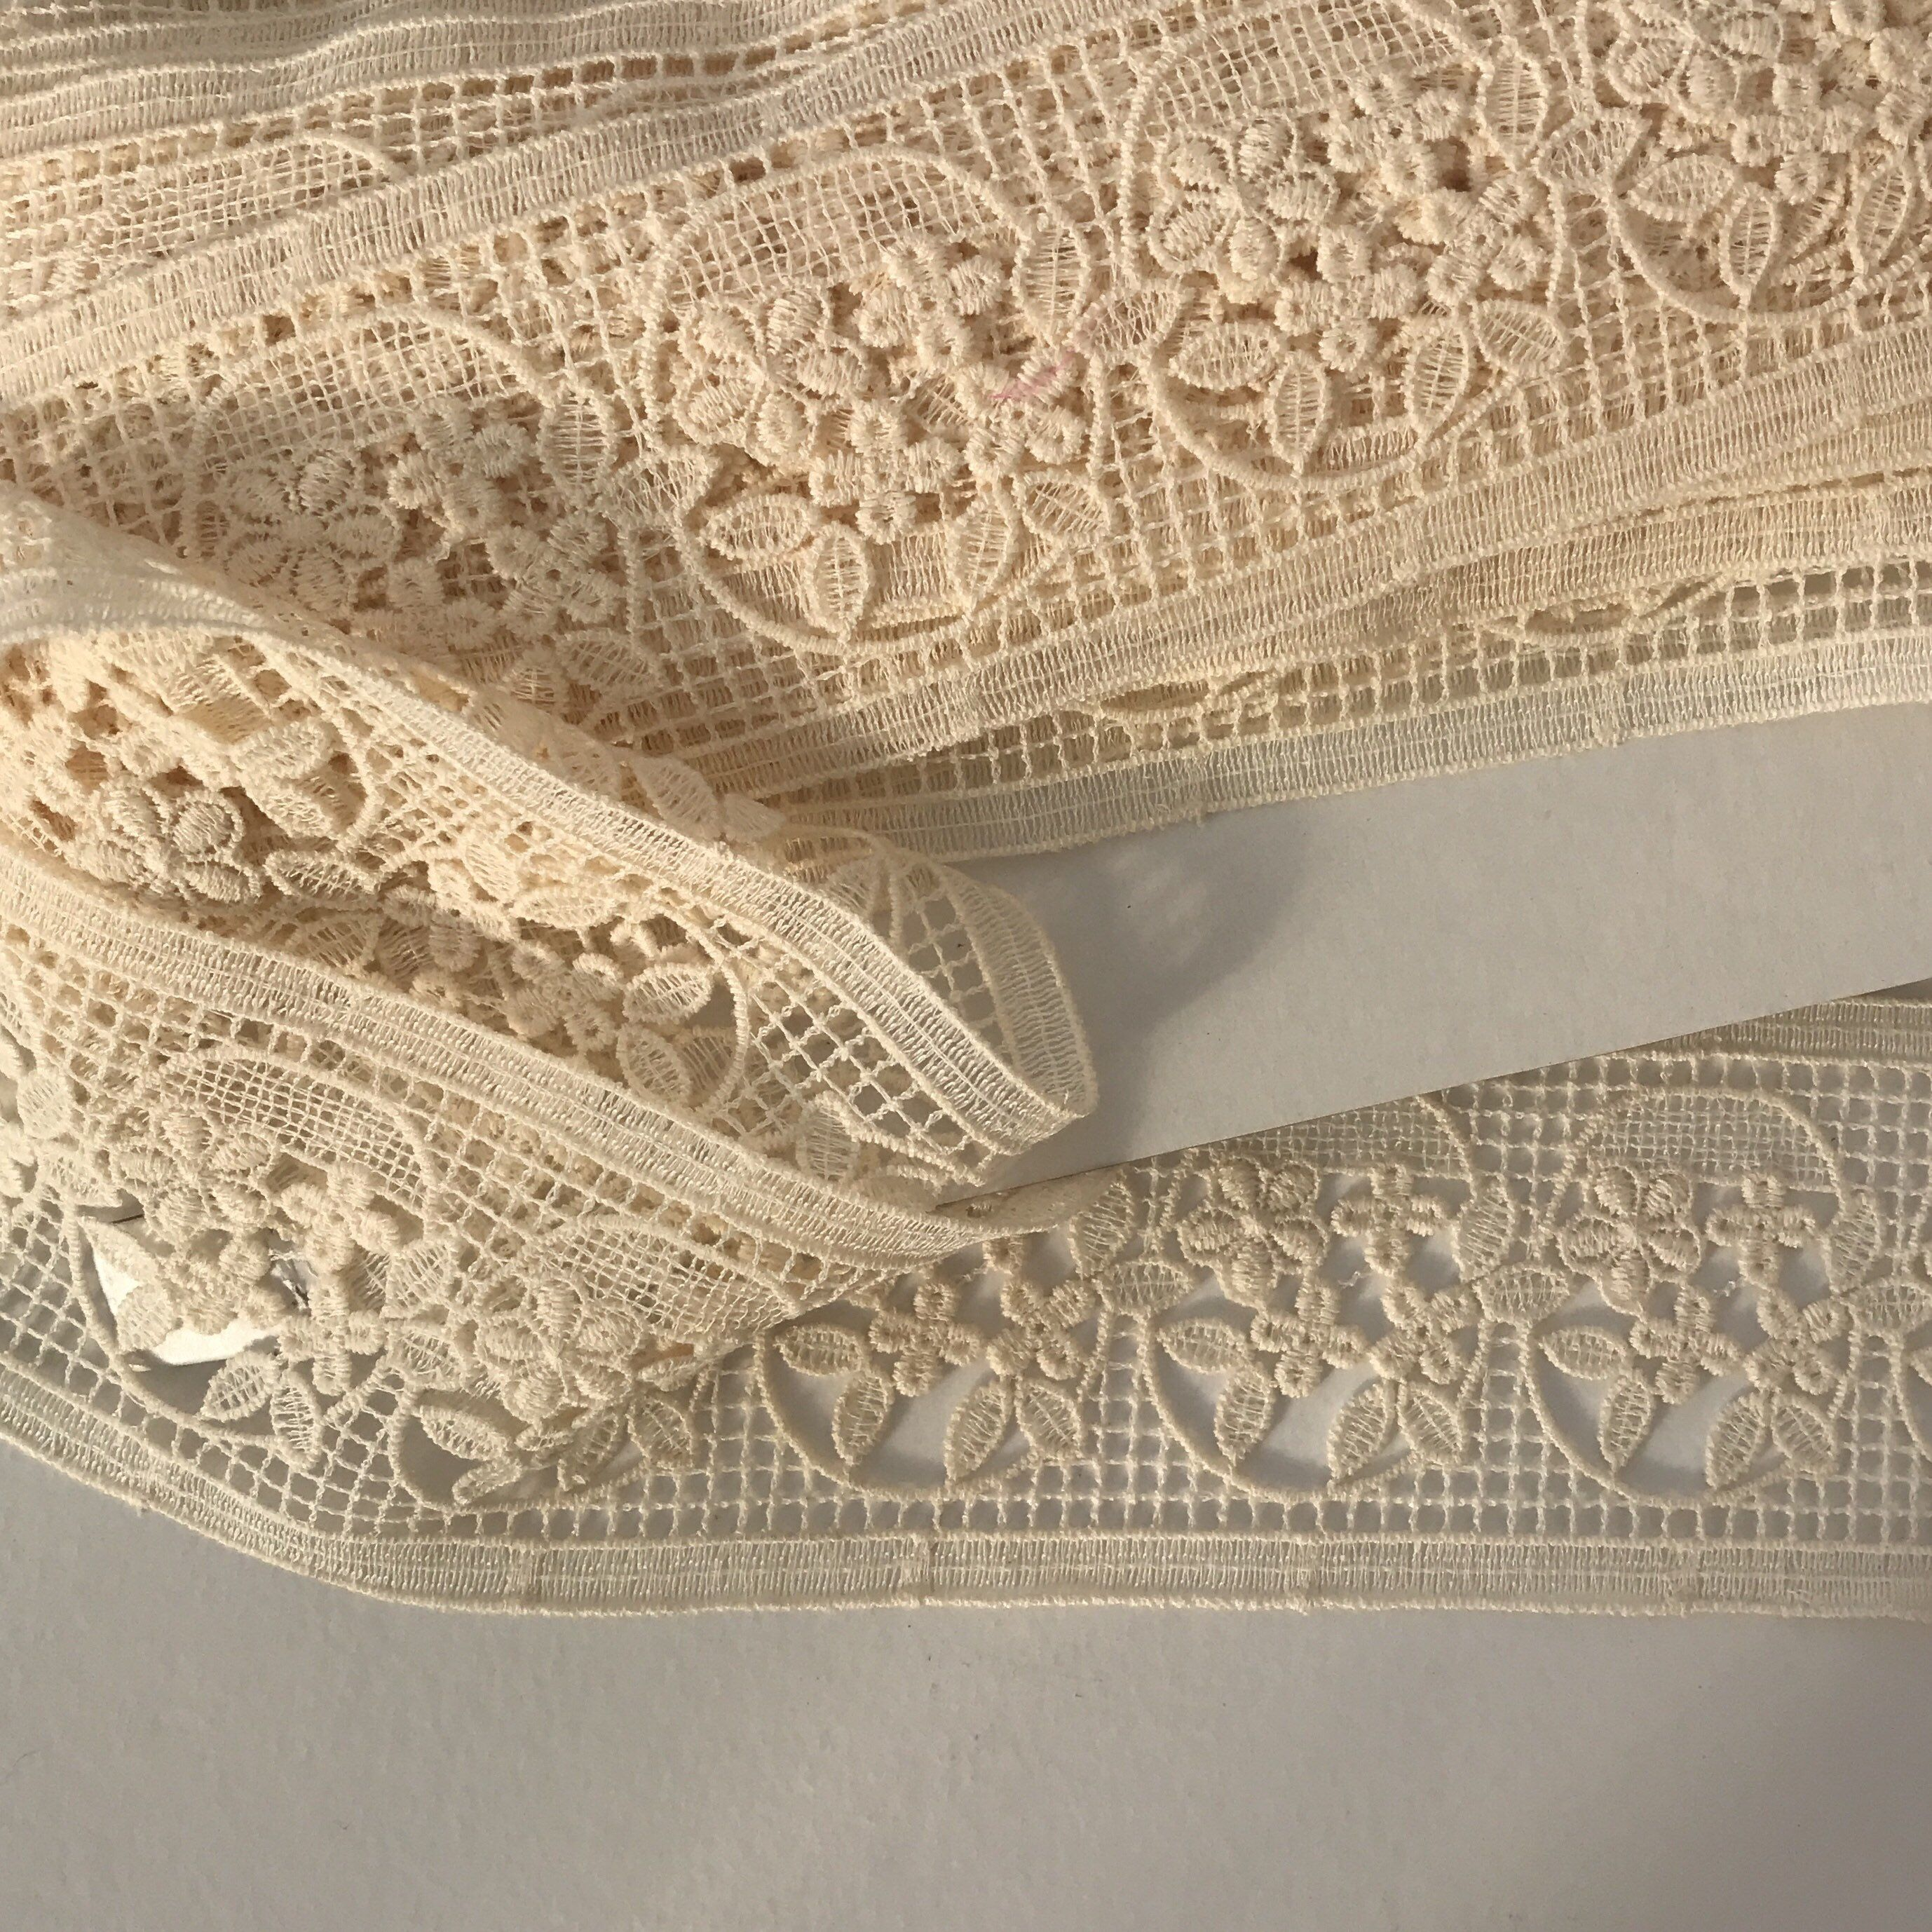 15 Metres Vintage French Cutwork Ribbon Vintage Ribbon Etsy Vintage Ribbon Vintage Bridal Accessories French Vintage